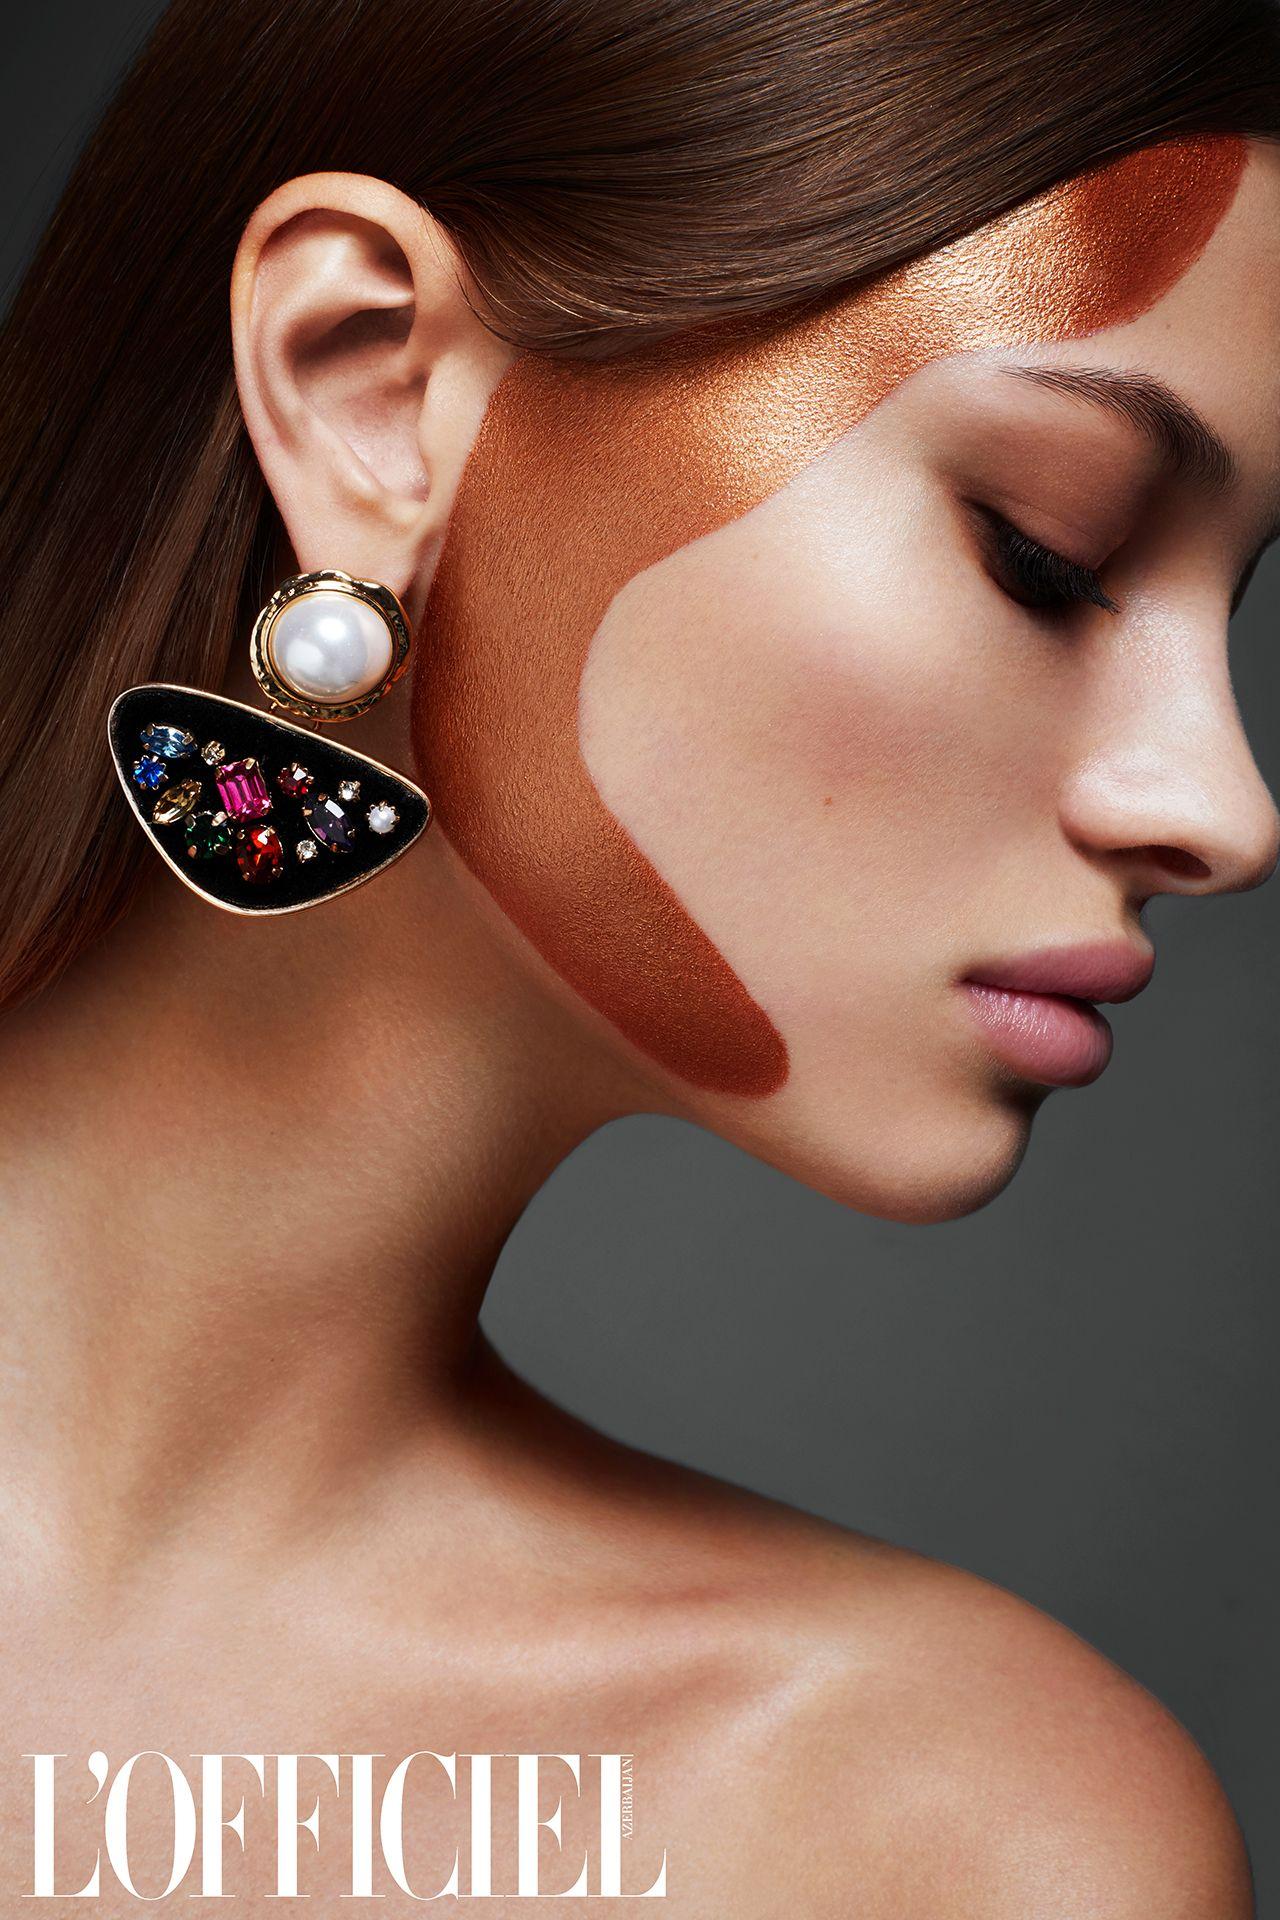 Beauty editorial for L`Officiel AzerbaijanModel is Lera c